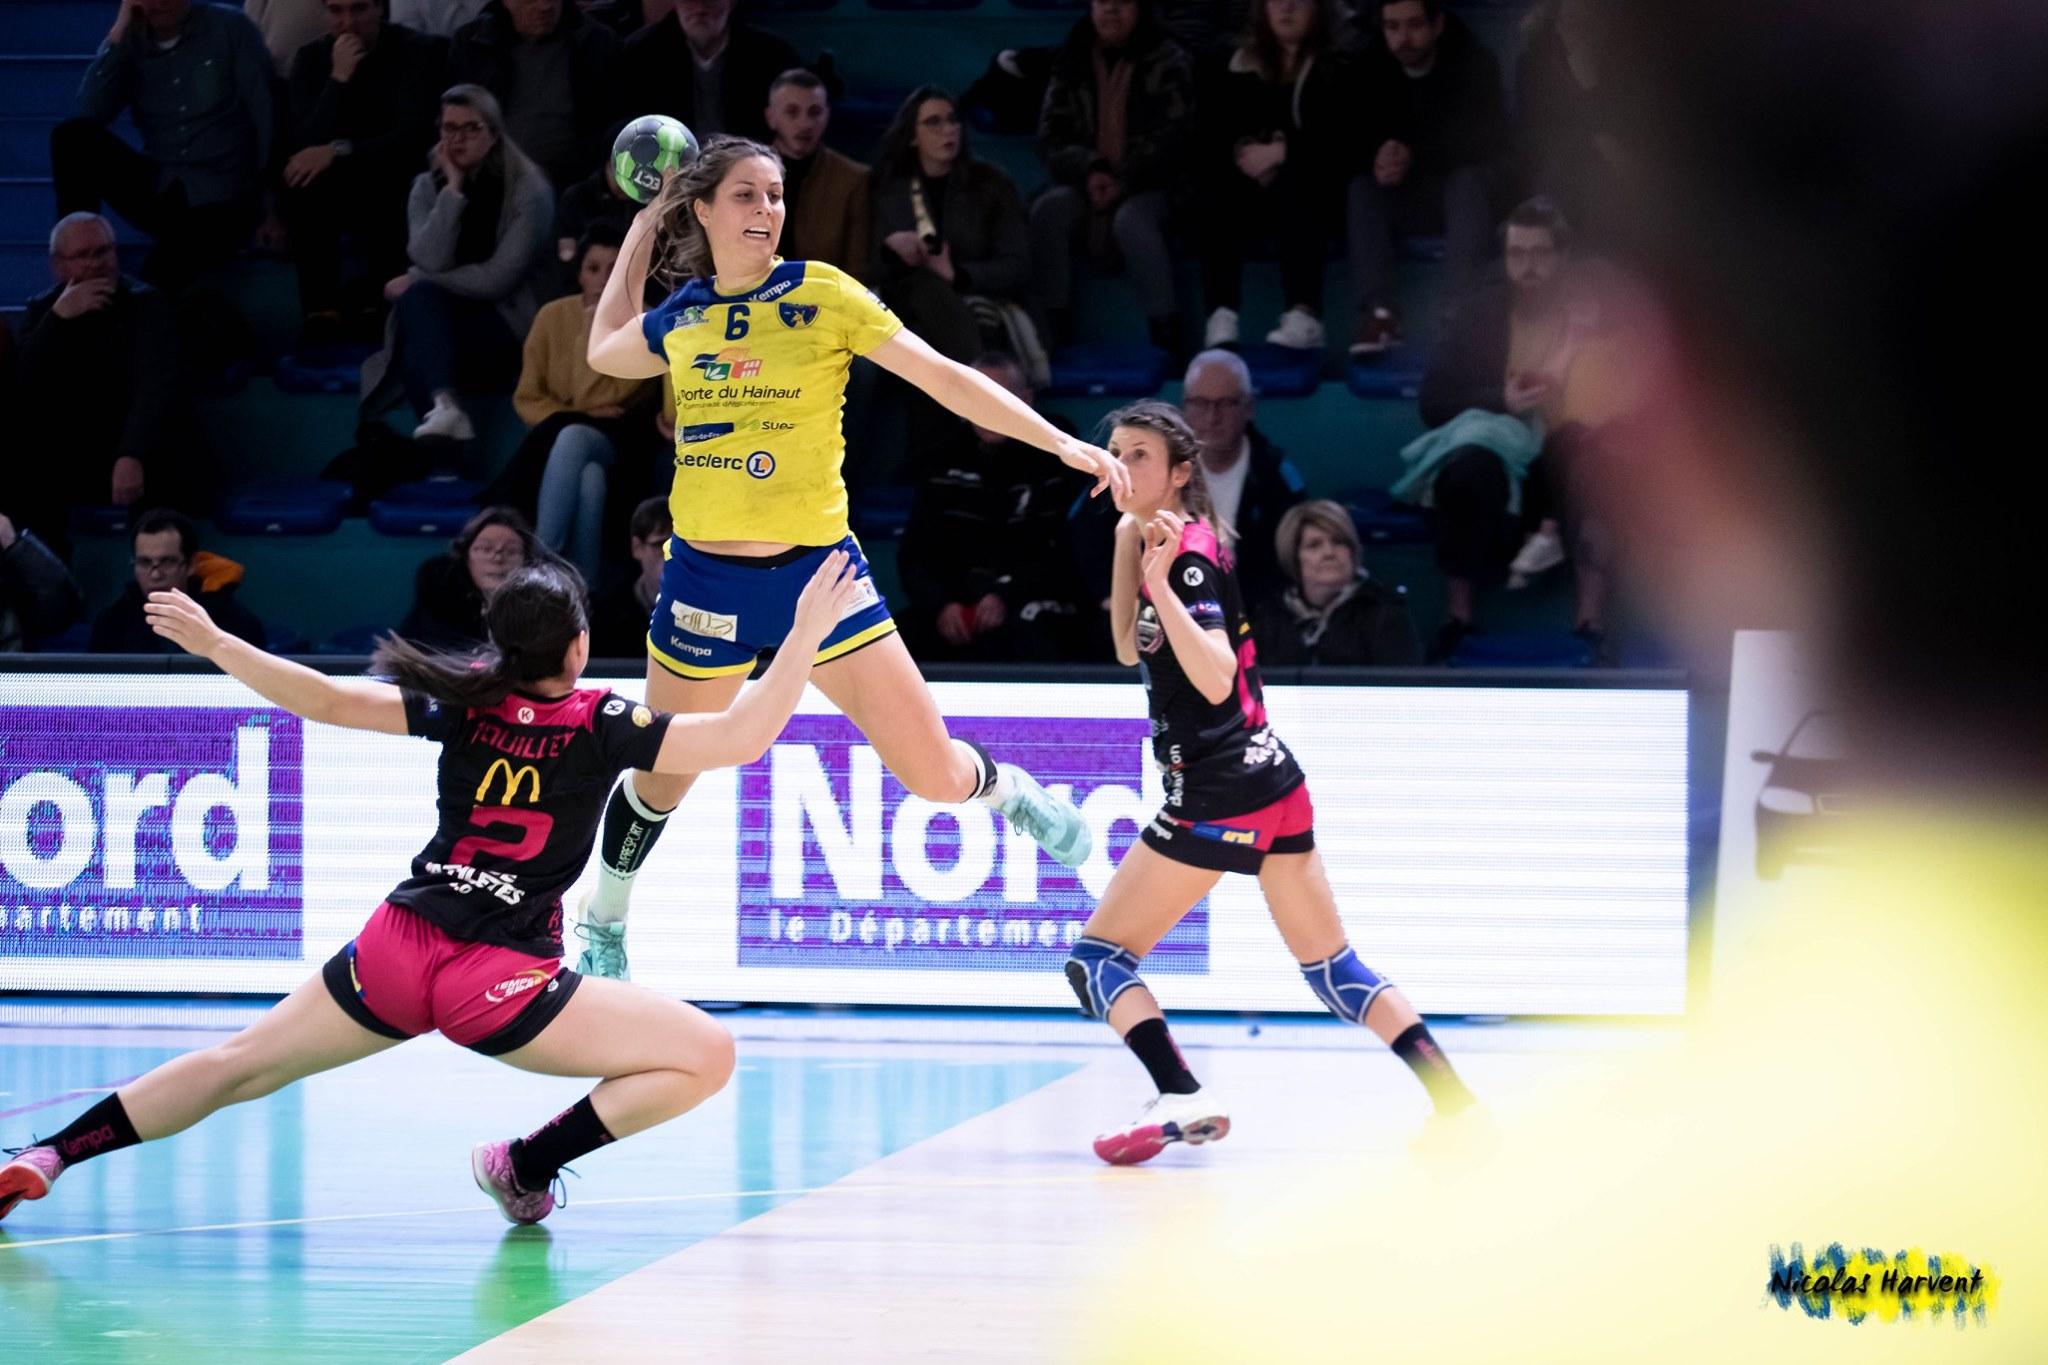 Le Saint-Amand Handball domine Clermont-Ferrand !